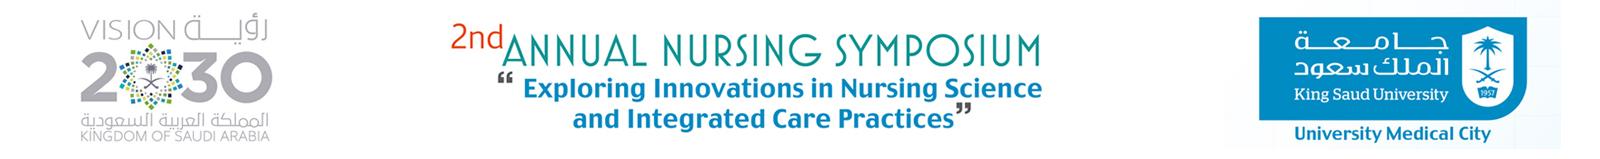 2nd Annual Nursing Symposium